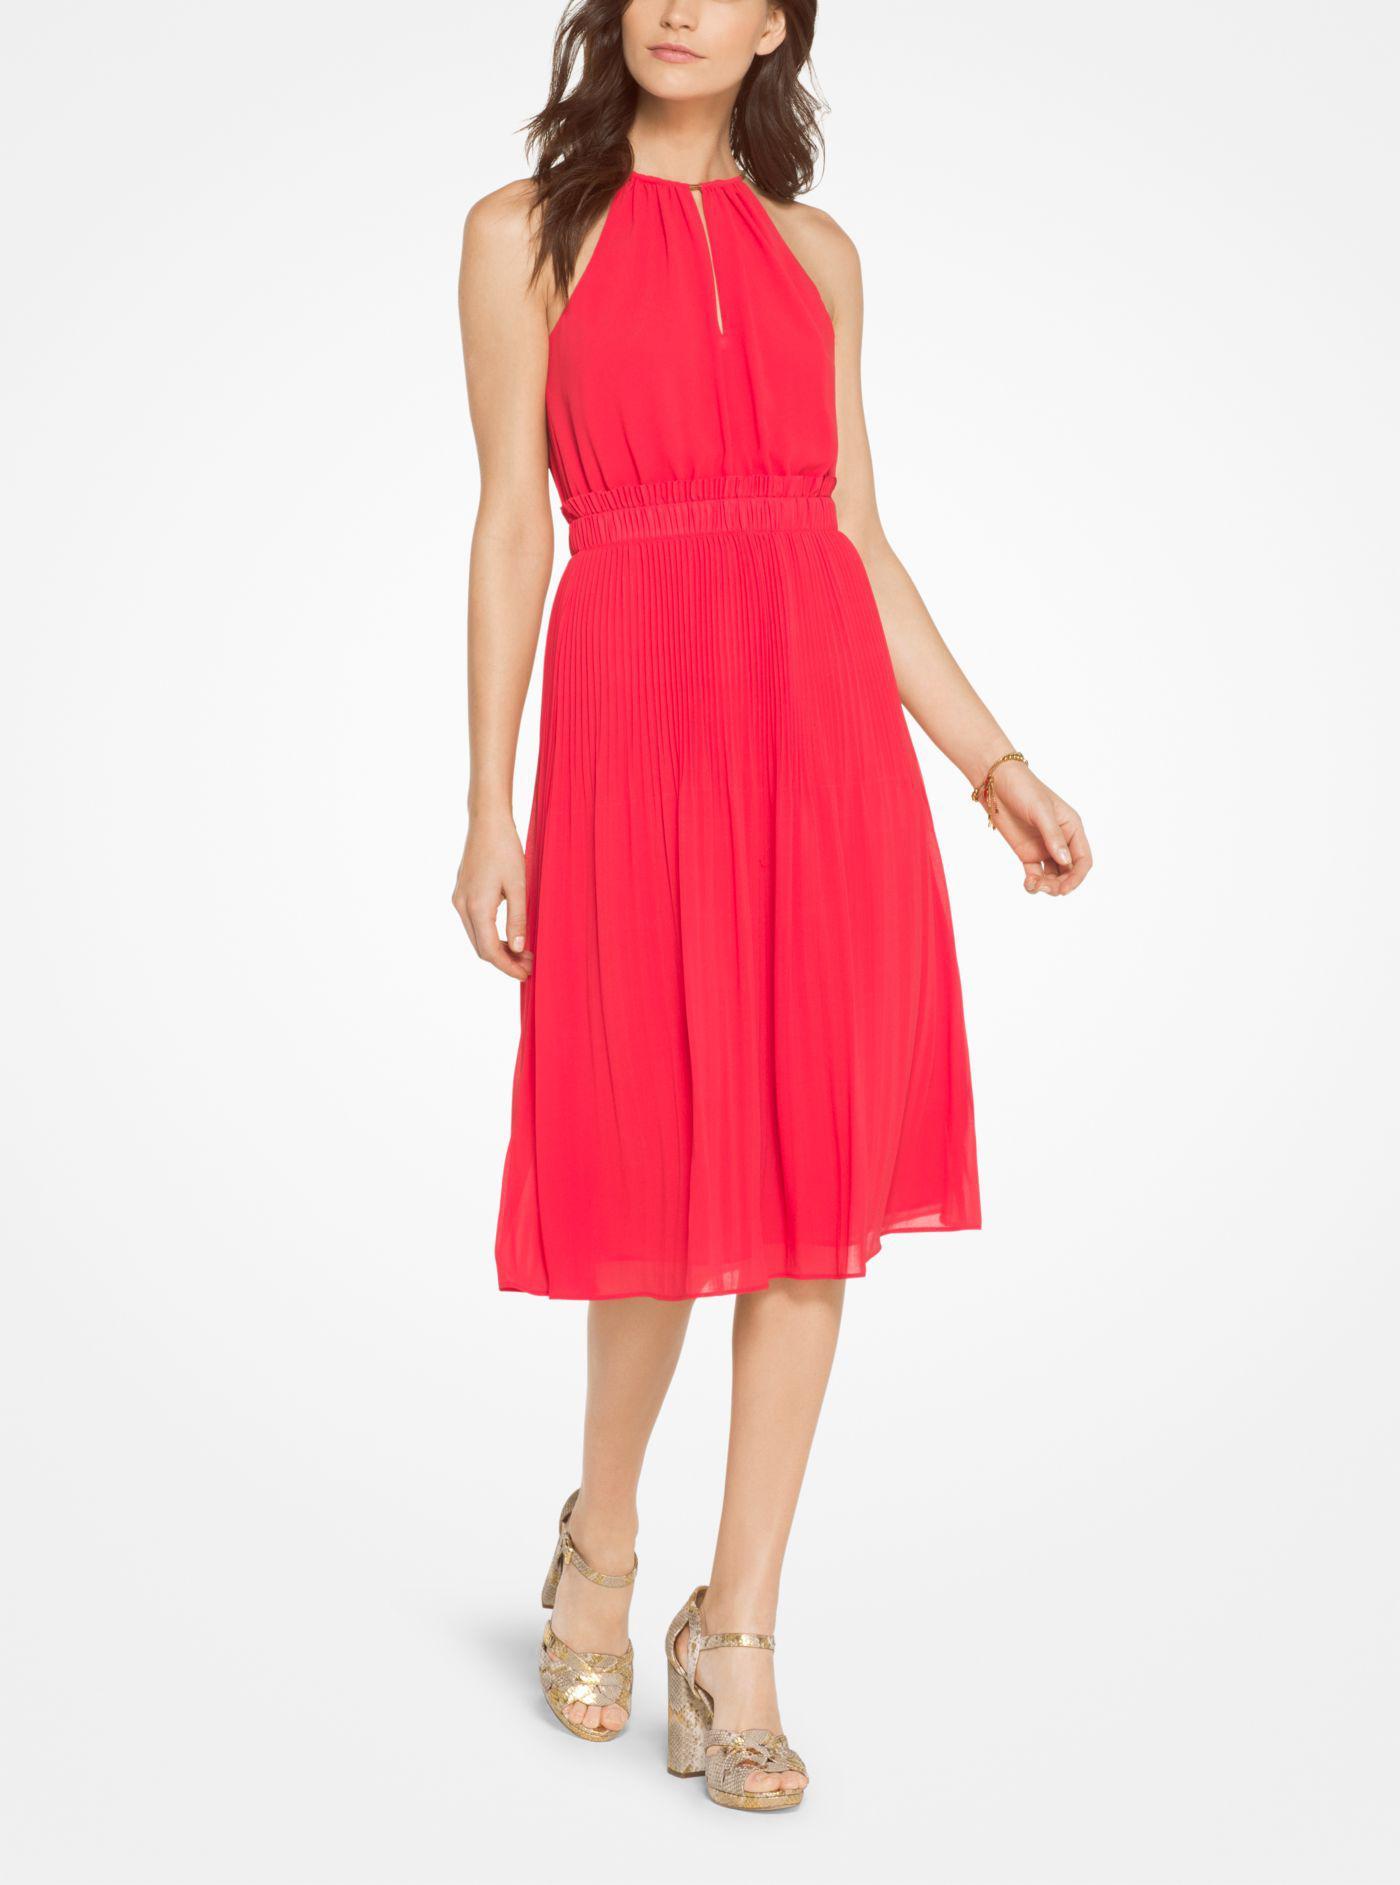 749998909b Lyst - Michael Kors Georgette Pleated Halter Dress in Red